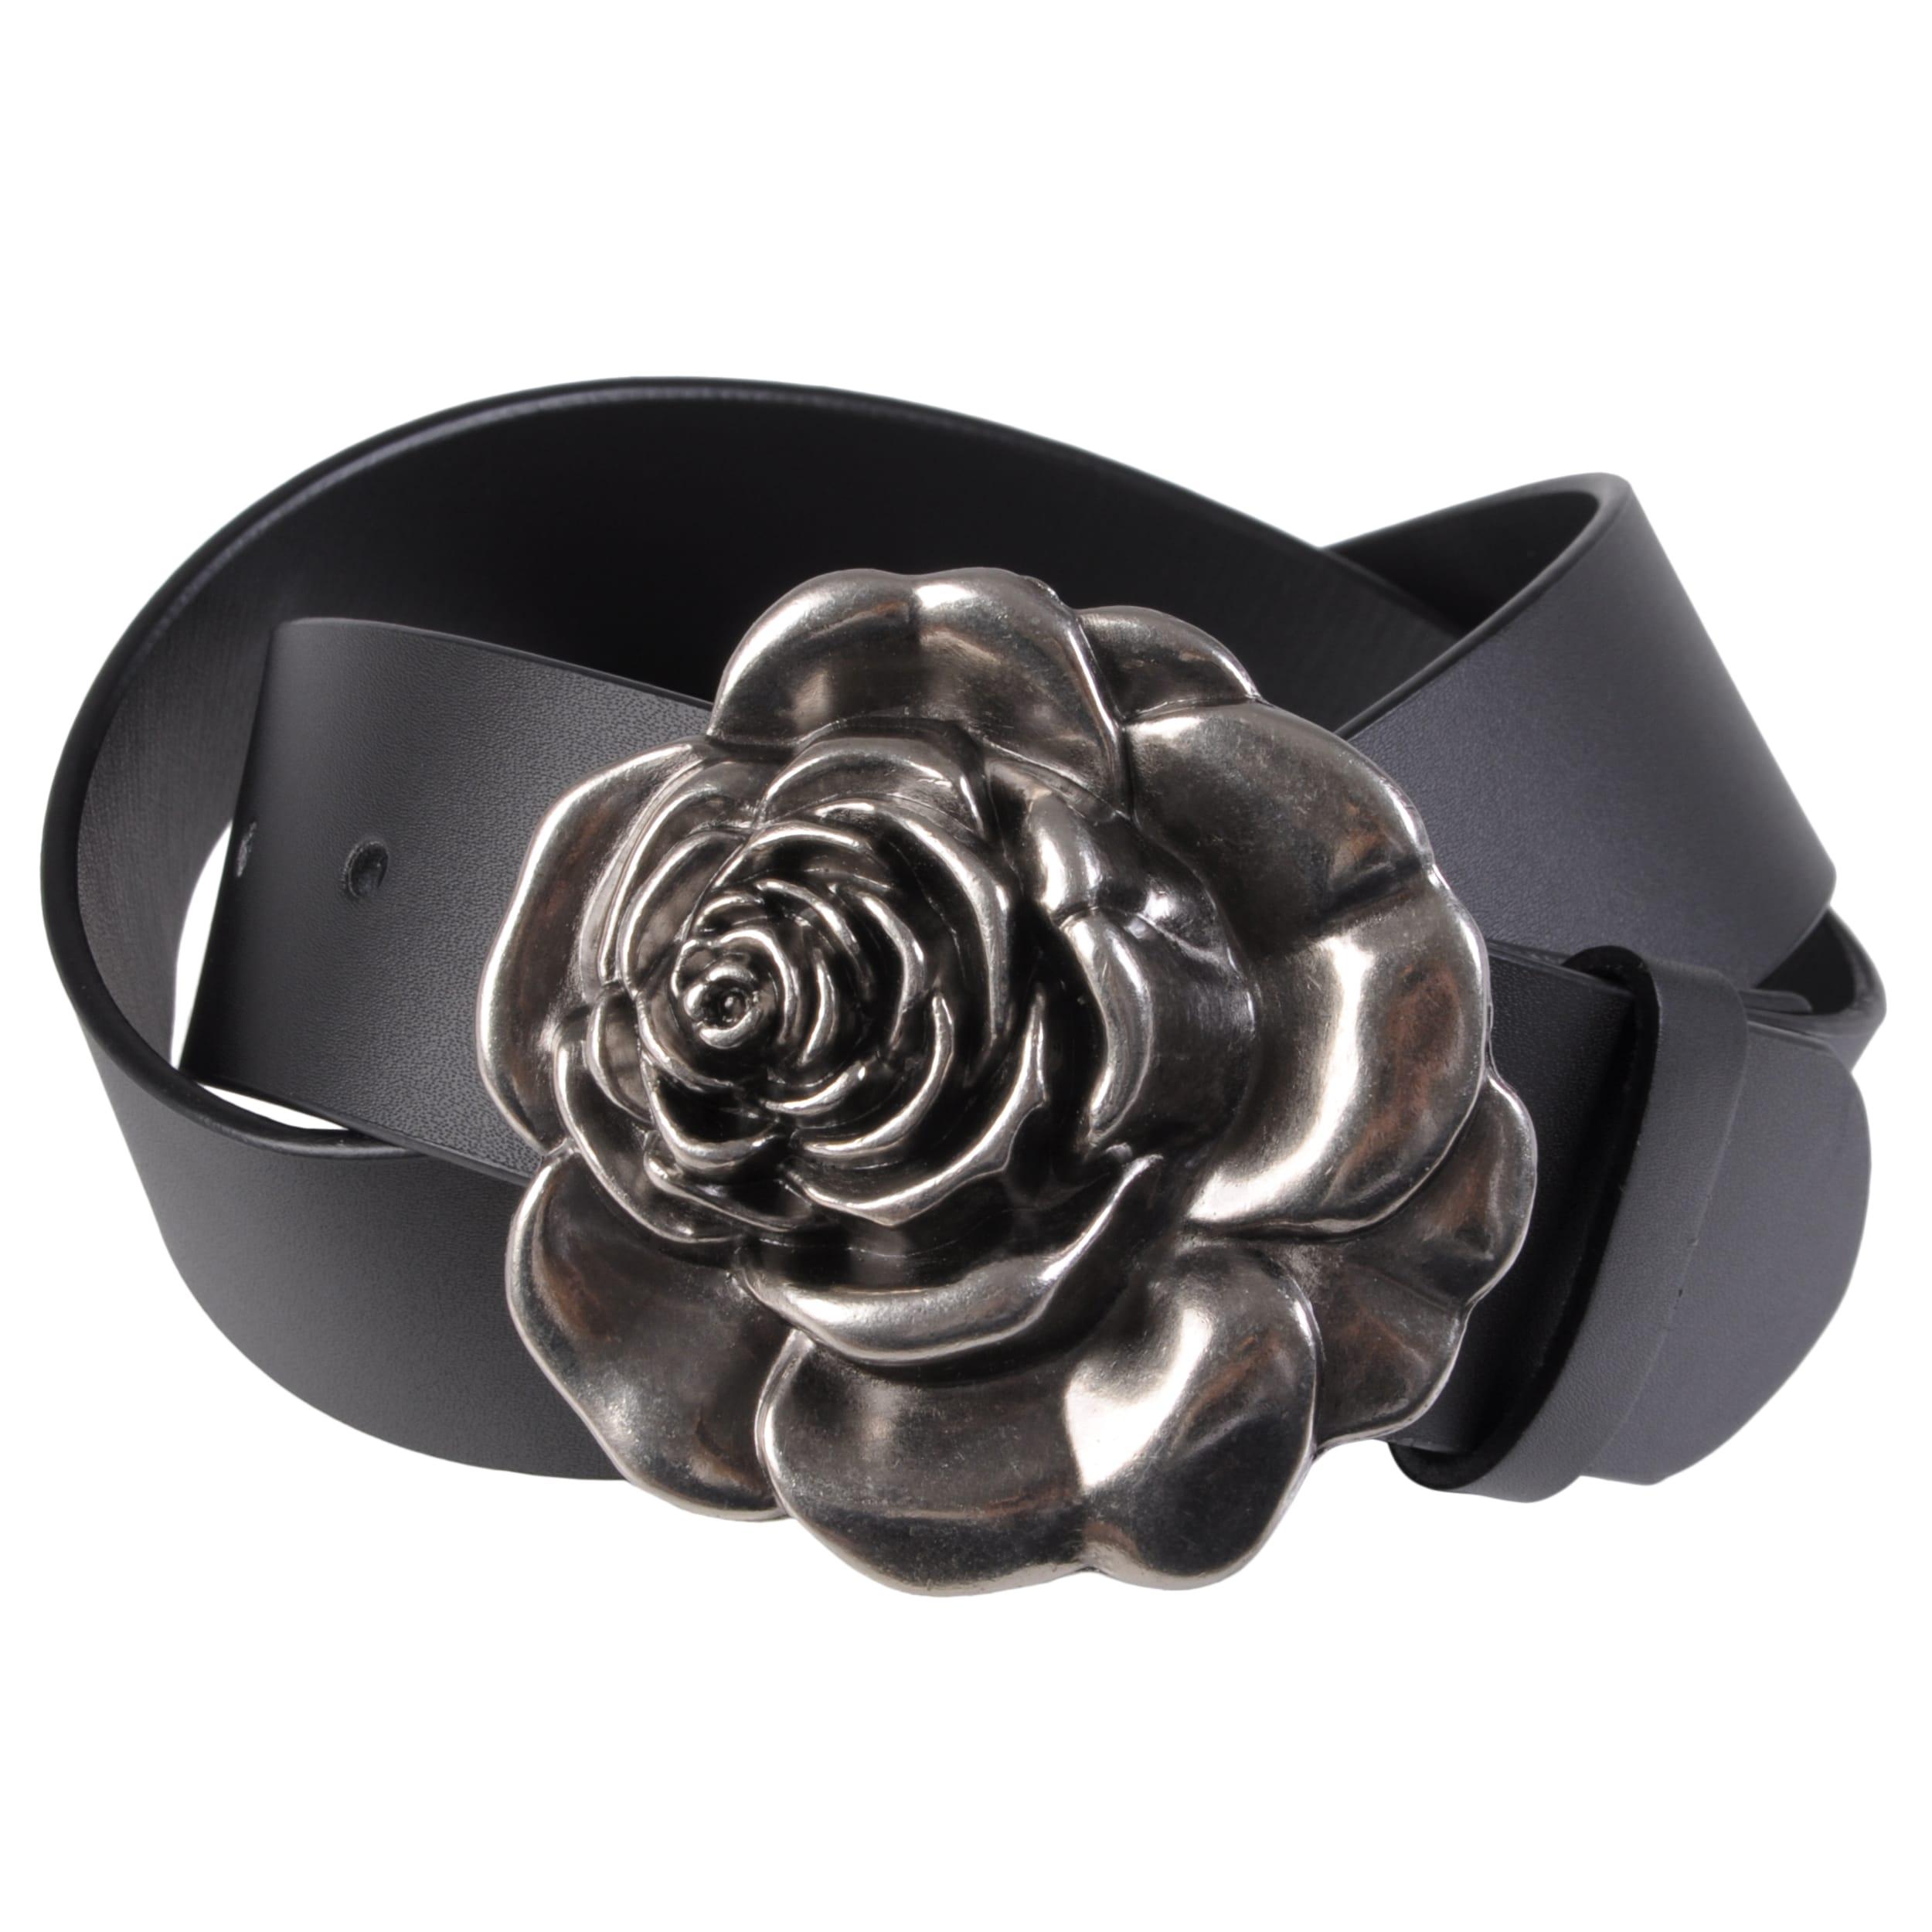 Journee Collection Women's Flower Buckle Leather Belt